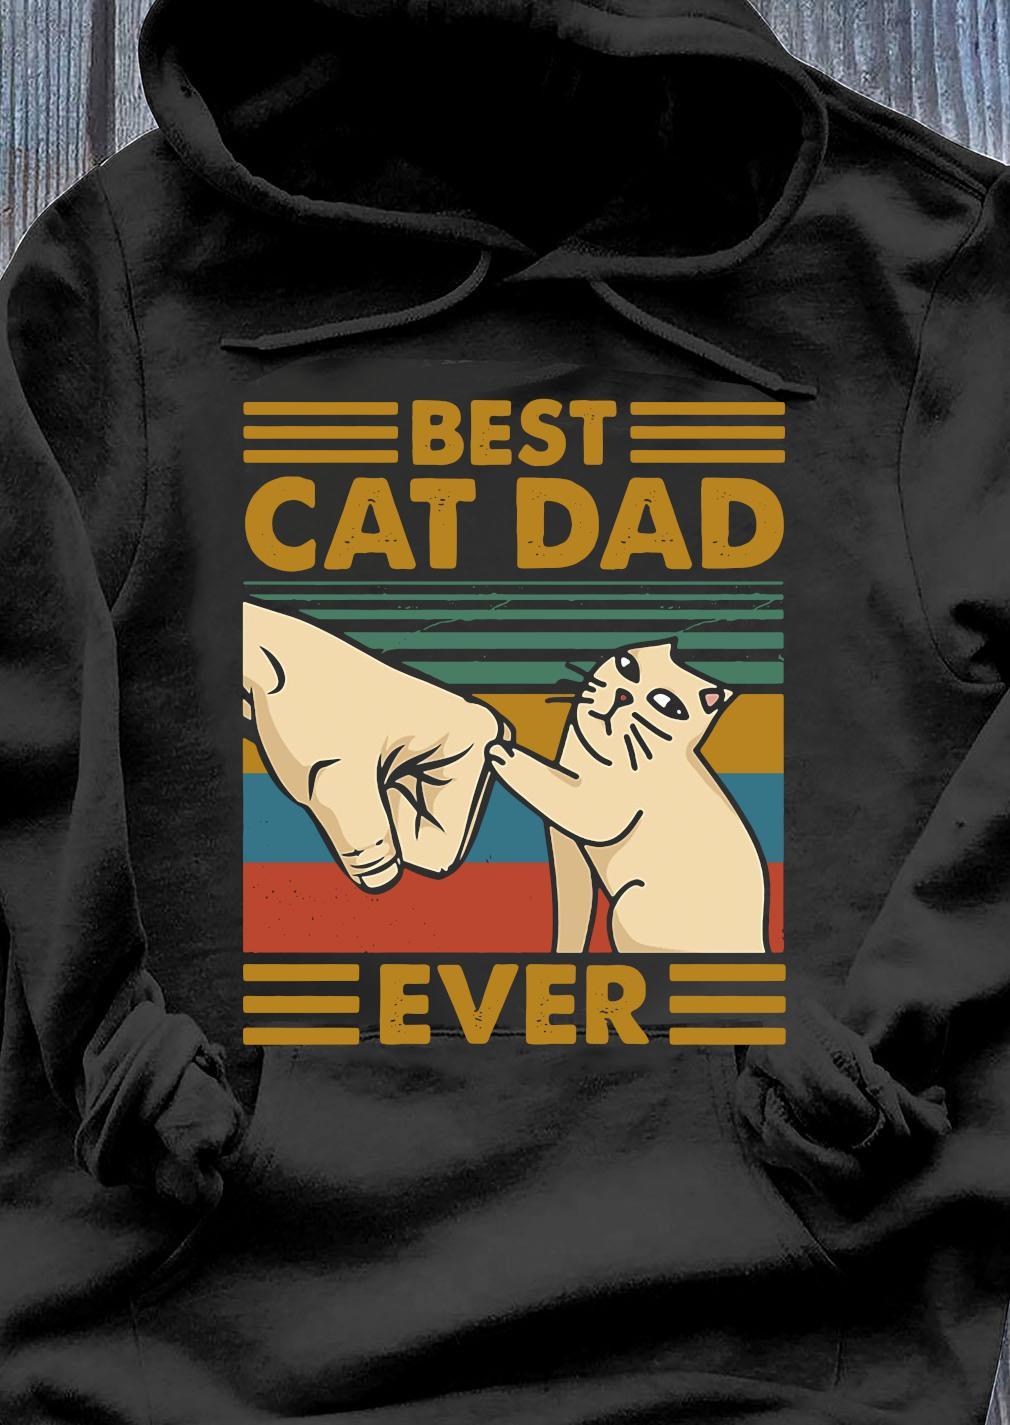 Best Cat Dad Ever Retro Vintage Shirt Hoodie